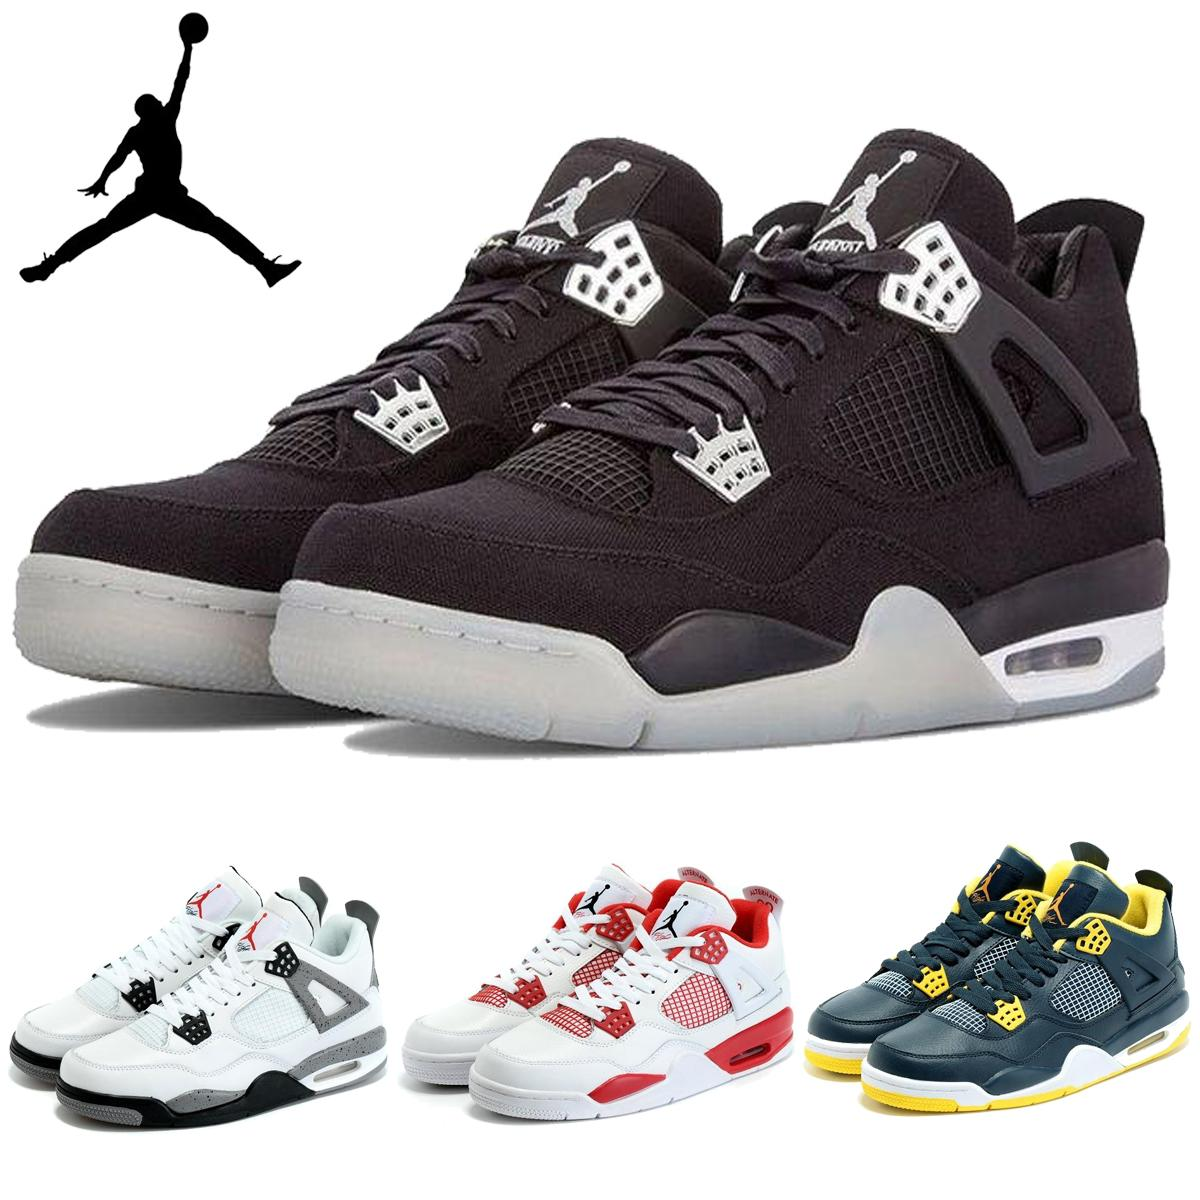 Acheter Nike Air Jordan 4 IV Retro Alternate 89 Blanc Noir Gym Red Mens  Basketball Chaussures De Sport AJ4 Jordan Chaussures Jordans J4 Sneakers De   101.53 ... e14864f1b5